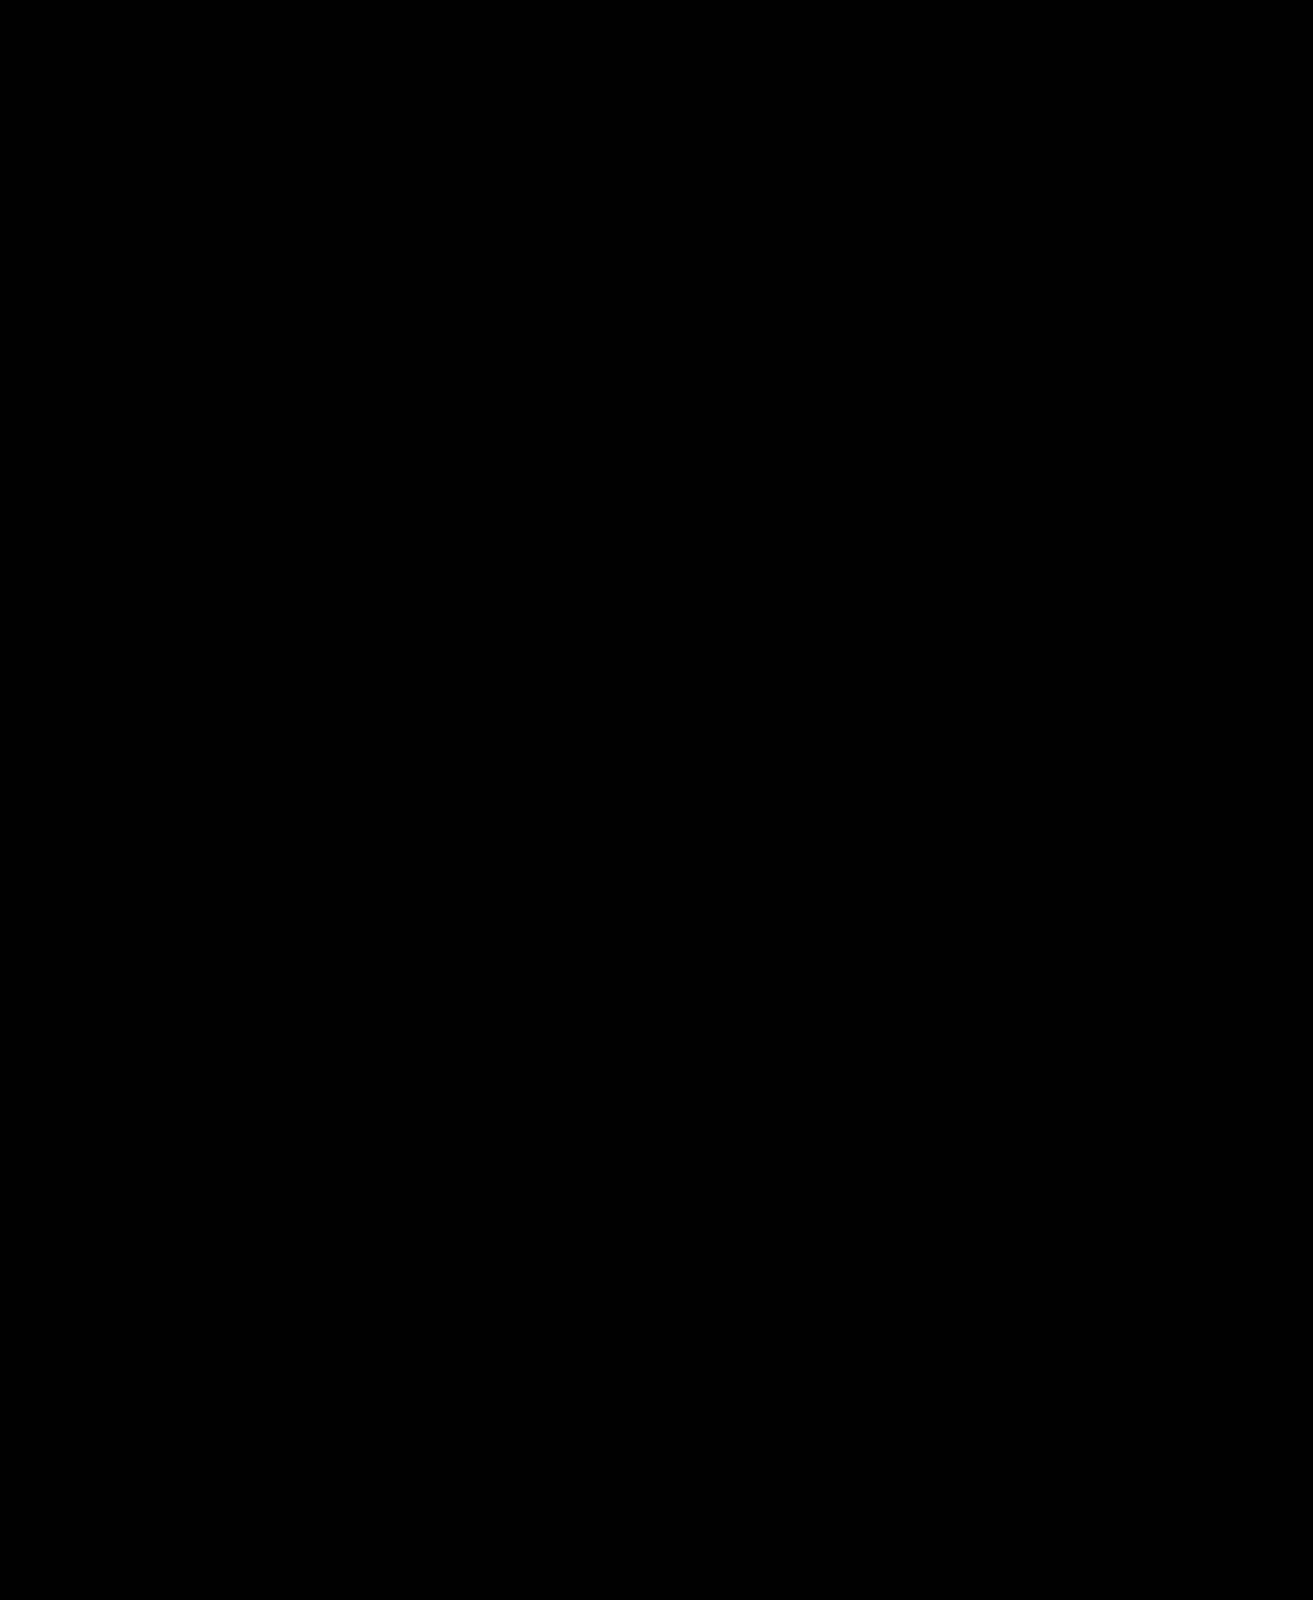 Logo Provinsi Dki Jakarta : provinsi, jakarta, Download, Provinsi, Indonesia, (2021/03/11, 134533), Gambar, Kartun,